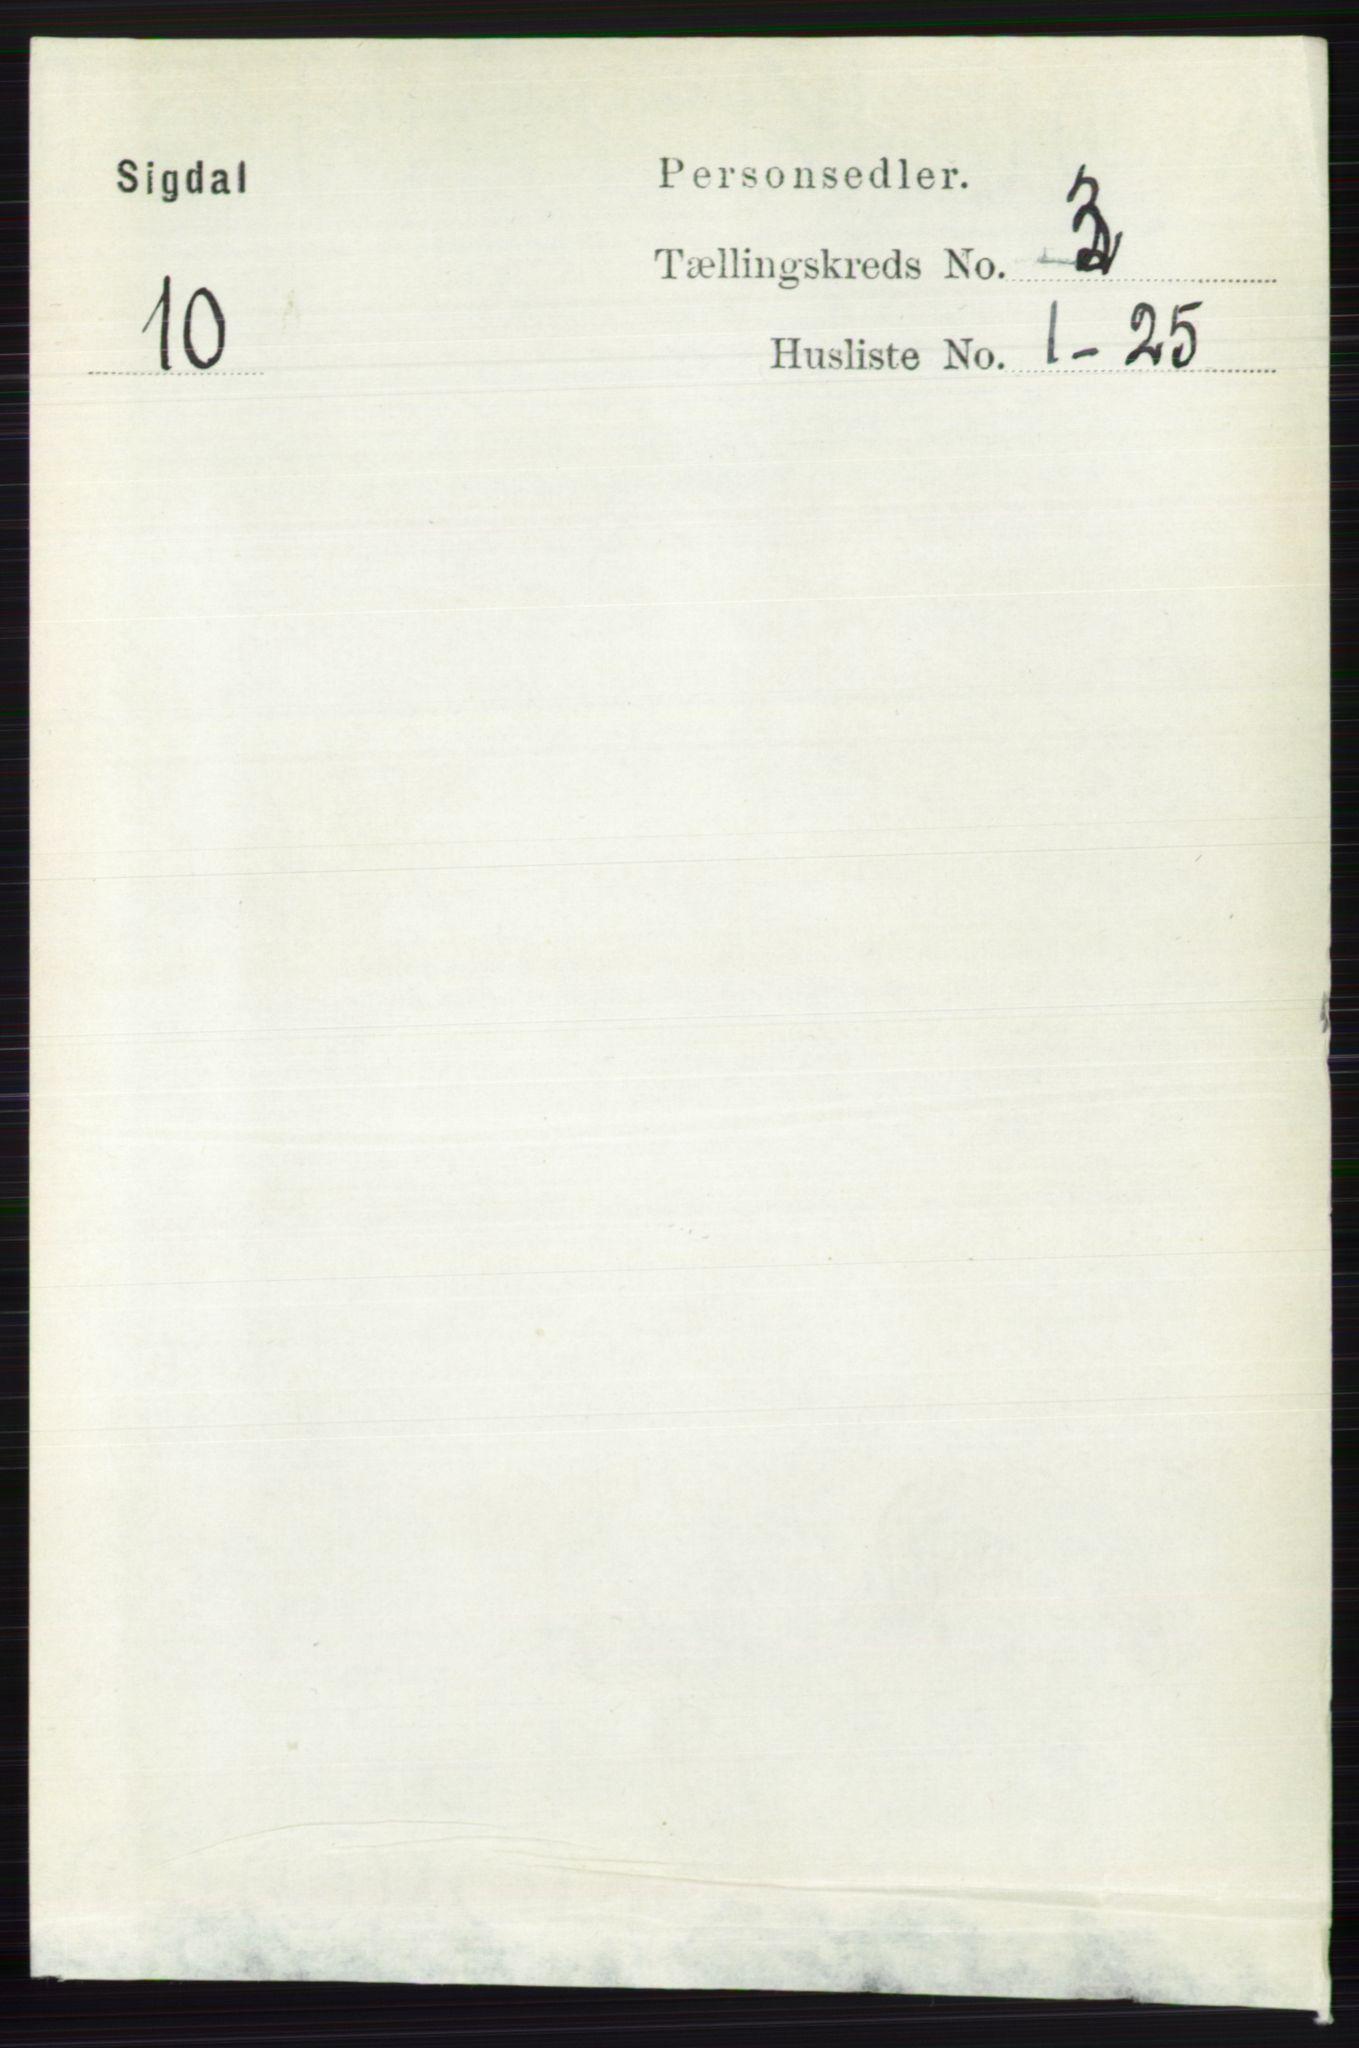 RA, Folketelling 1891 for 0621 Sigdal herred, 1891, s. 1337